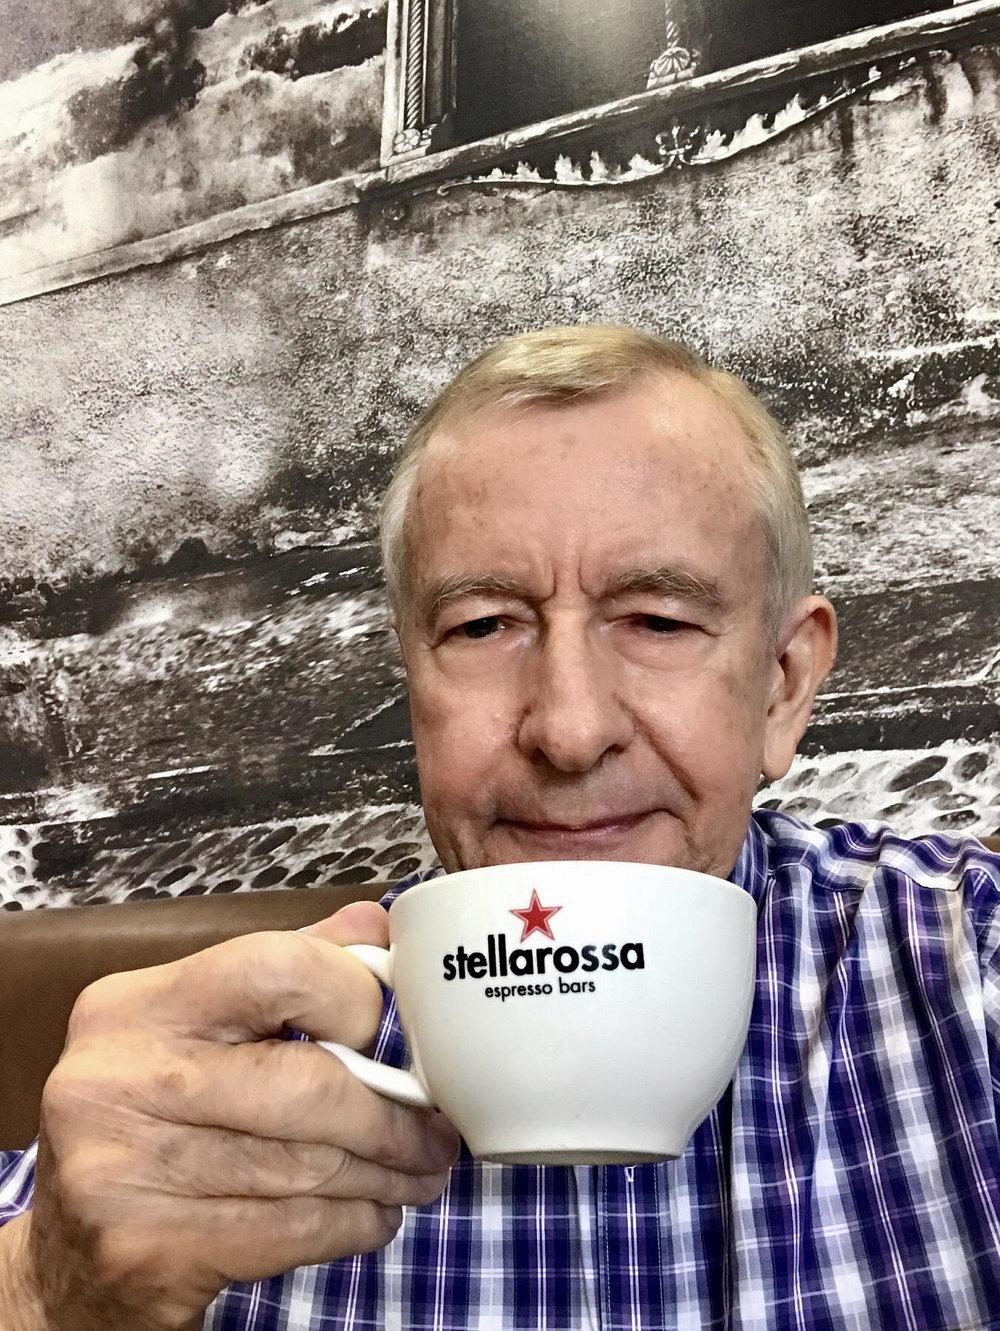 Stellarossa espresso bar.jpg